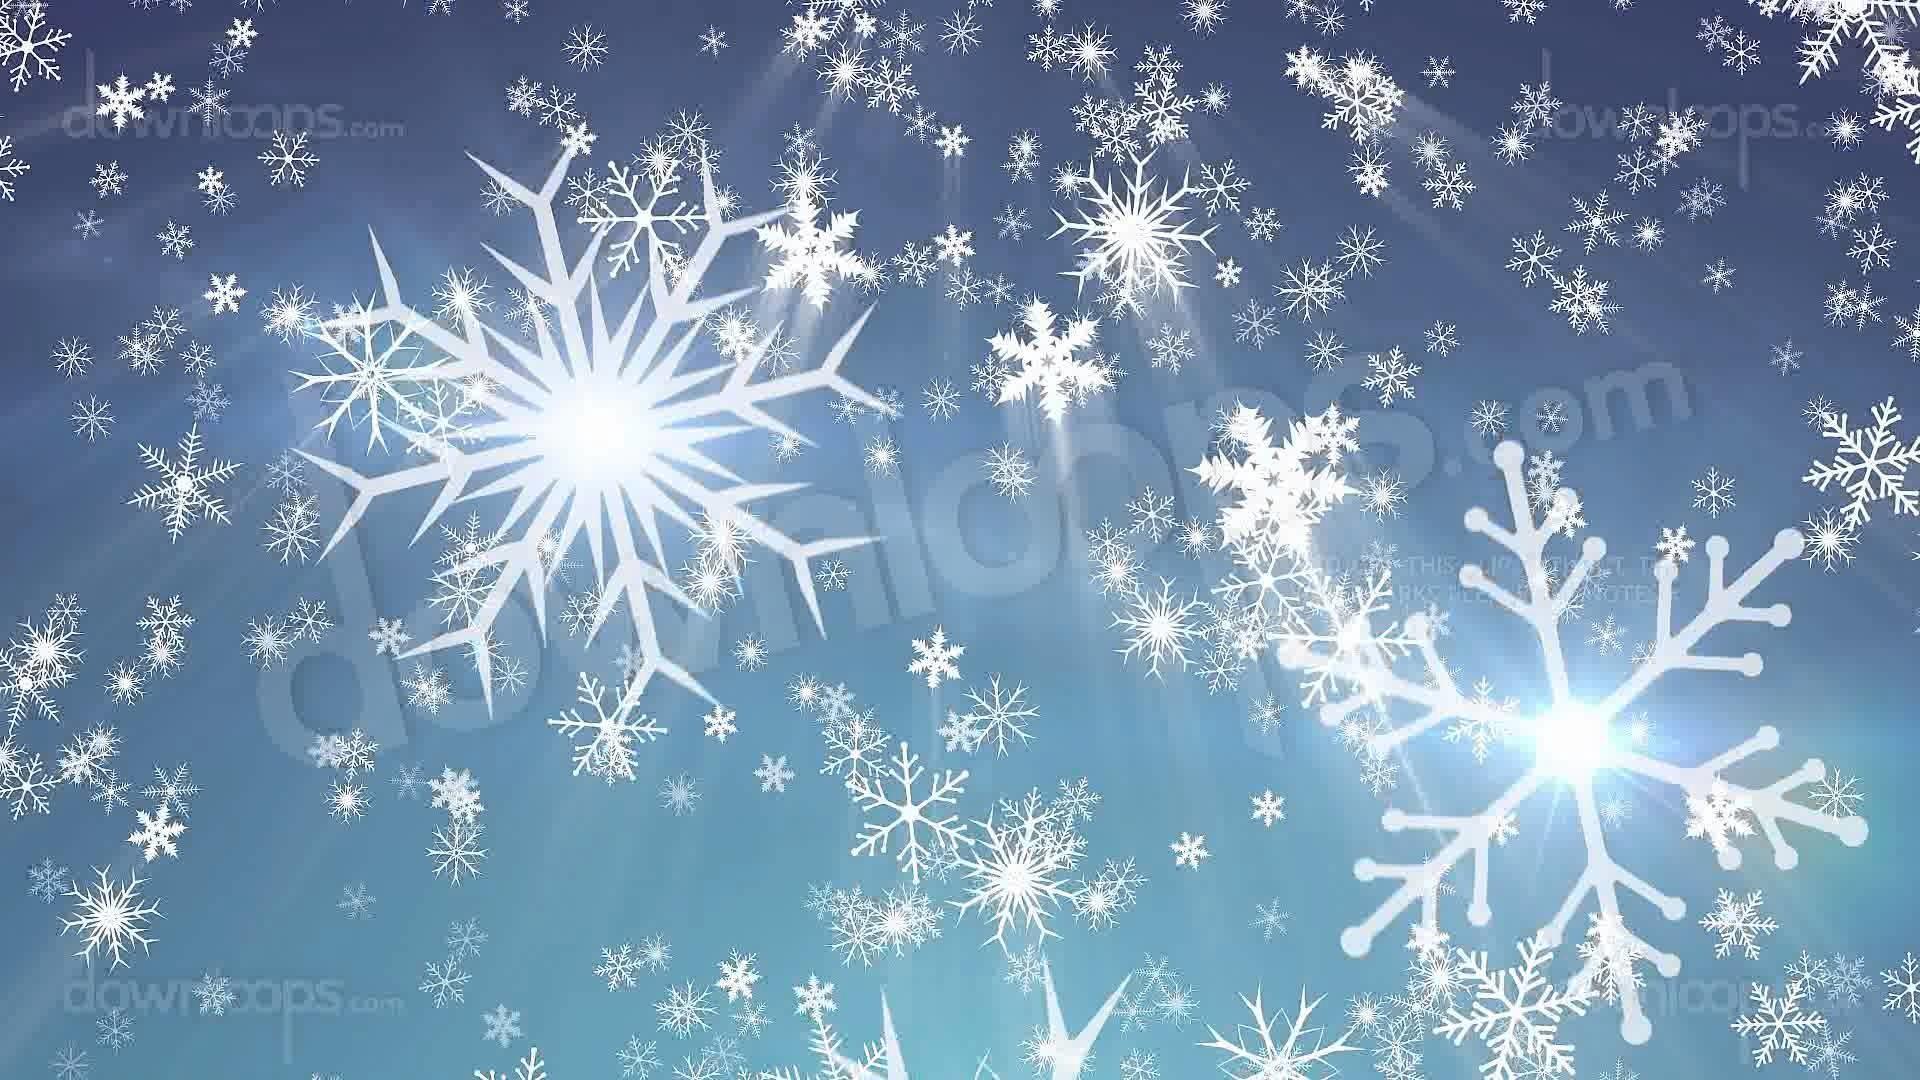 Animated Snow Background Maxresdefault.jpg